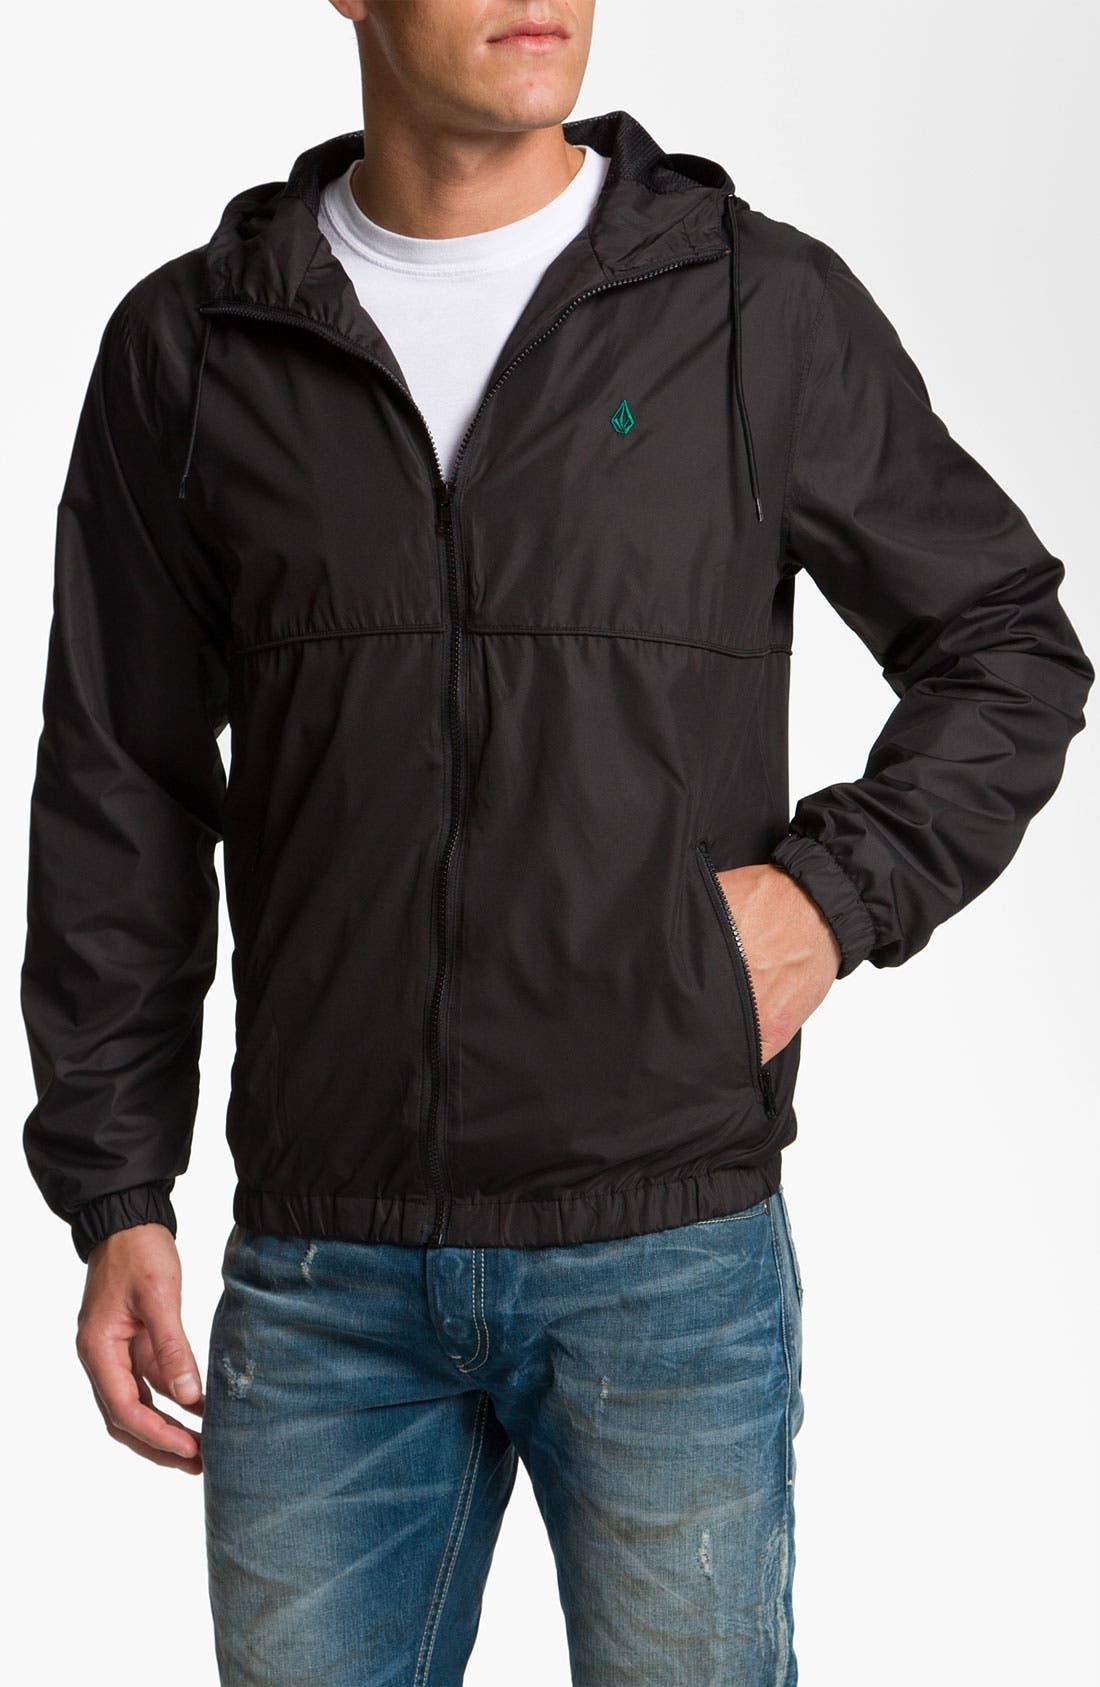 Alternate Image 1 Selected - Volcom 'Swisher' Windbreaker Jacket